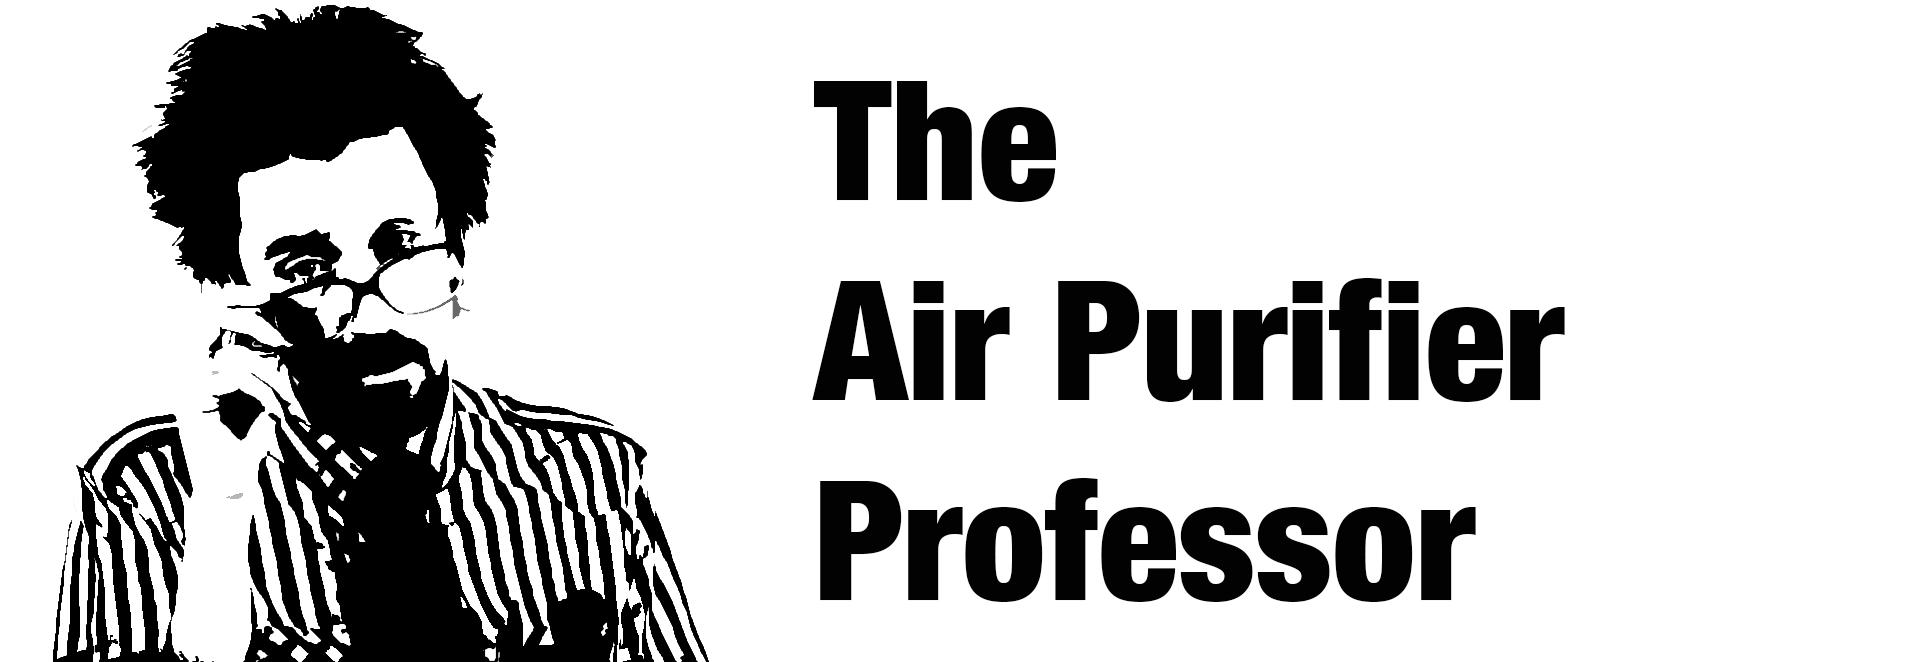 The Air Purifier Professor